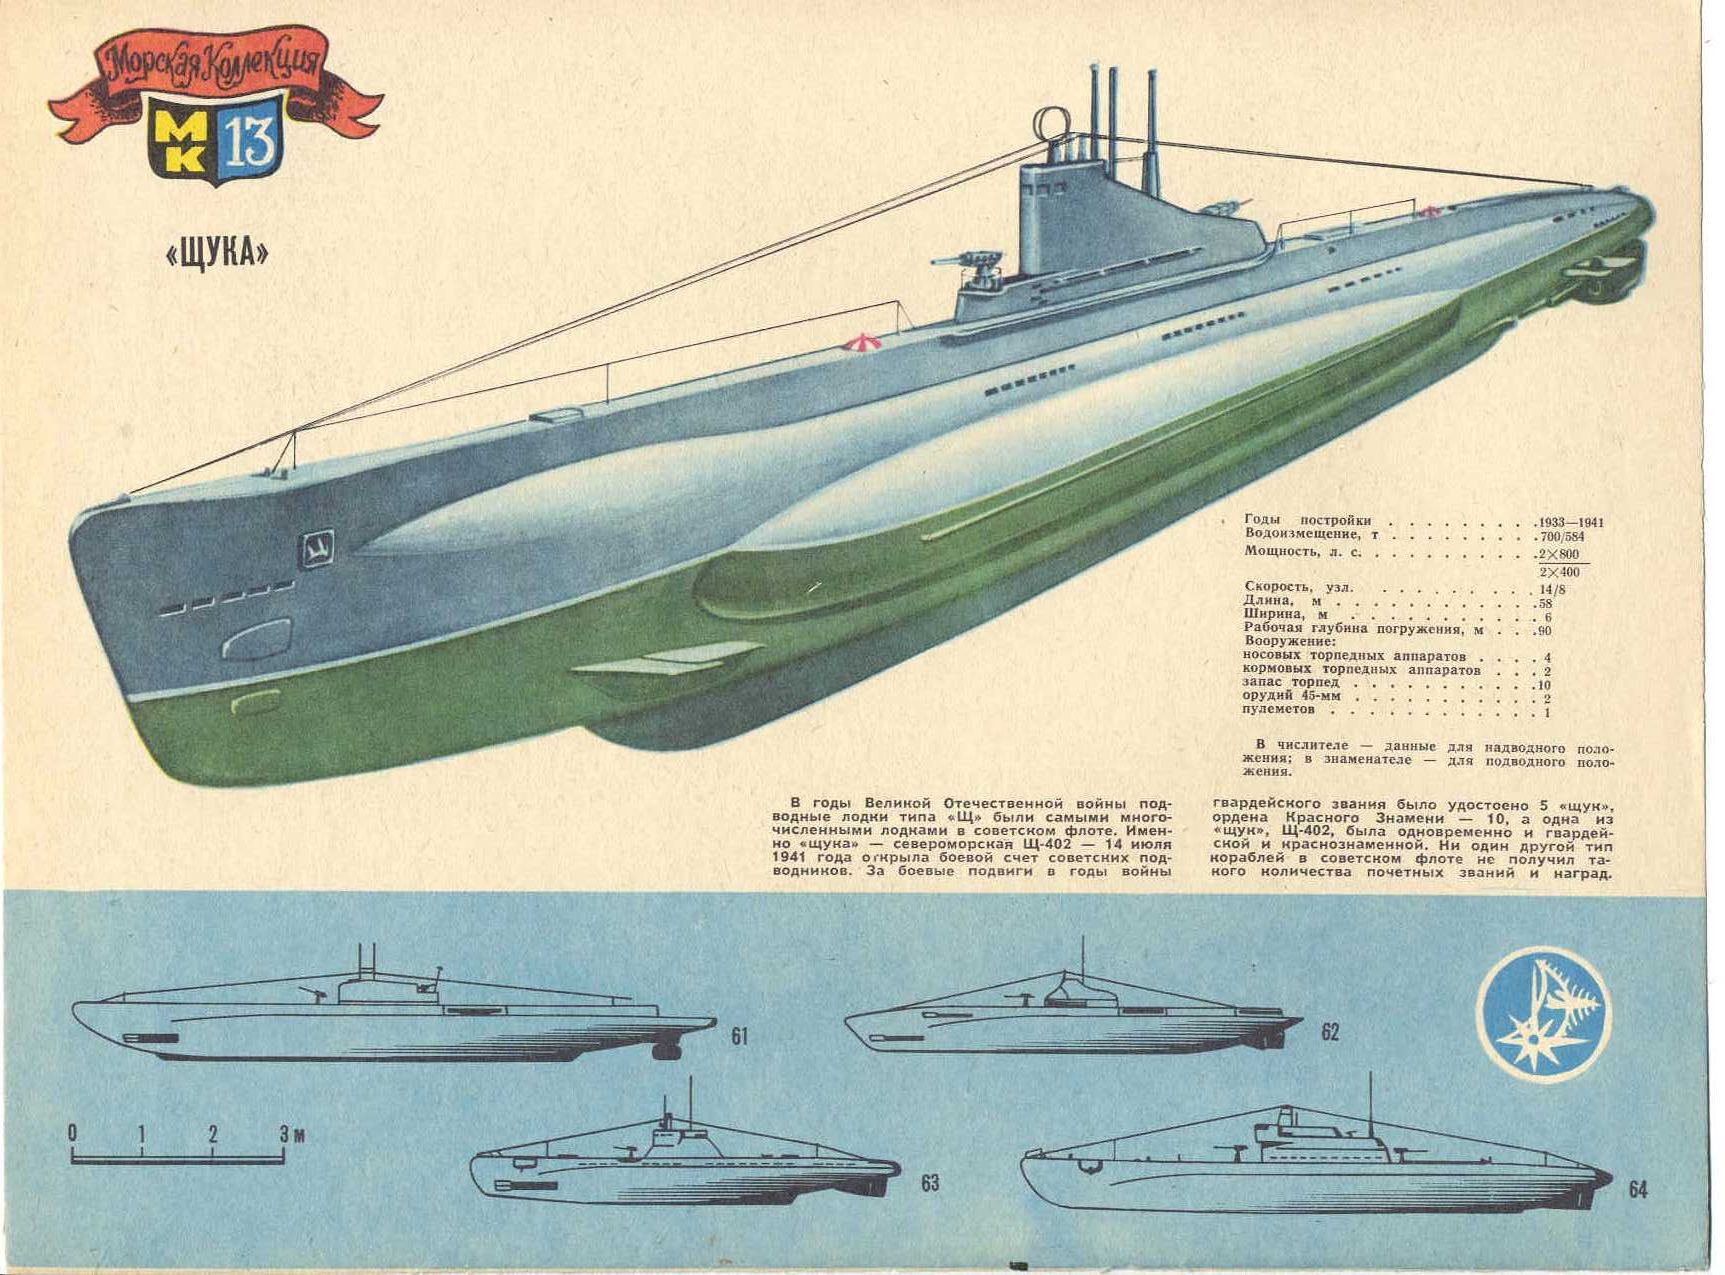 подводная лодка с фото и описанием